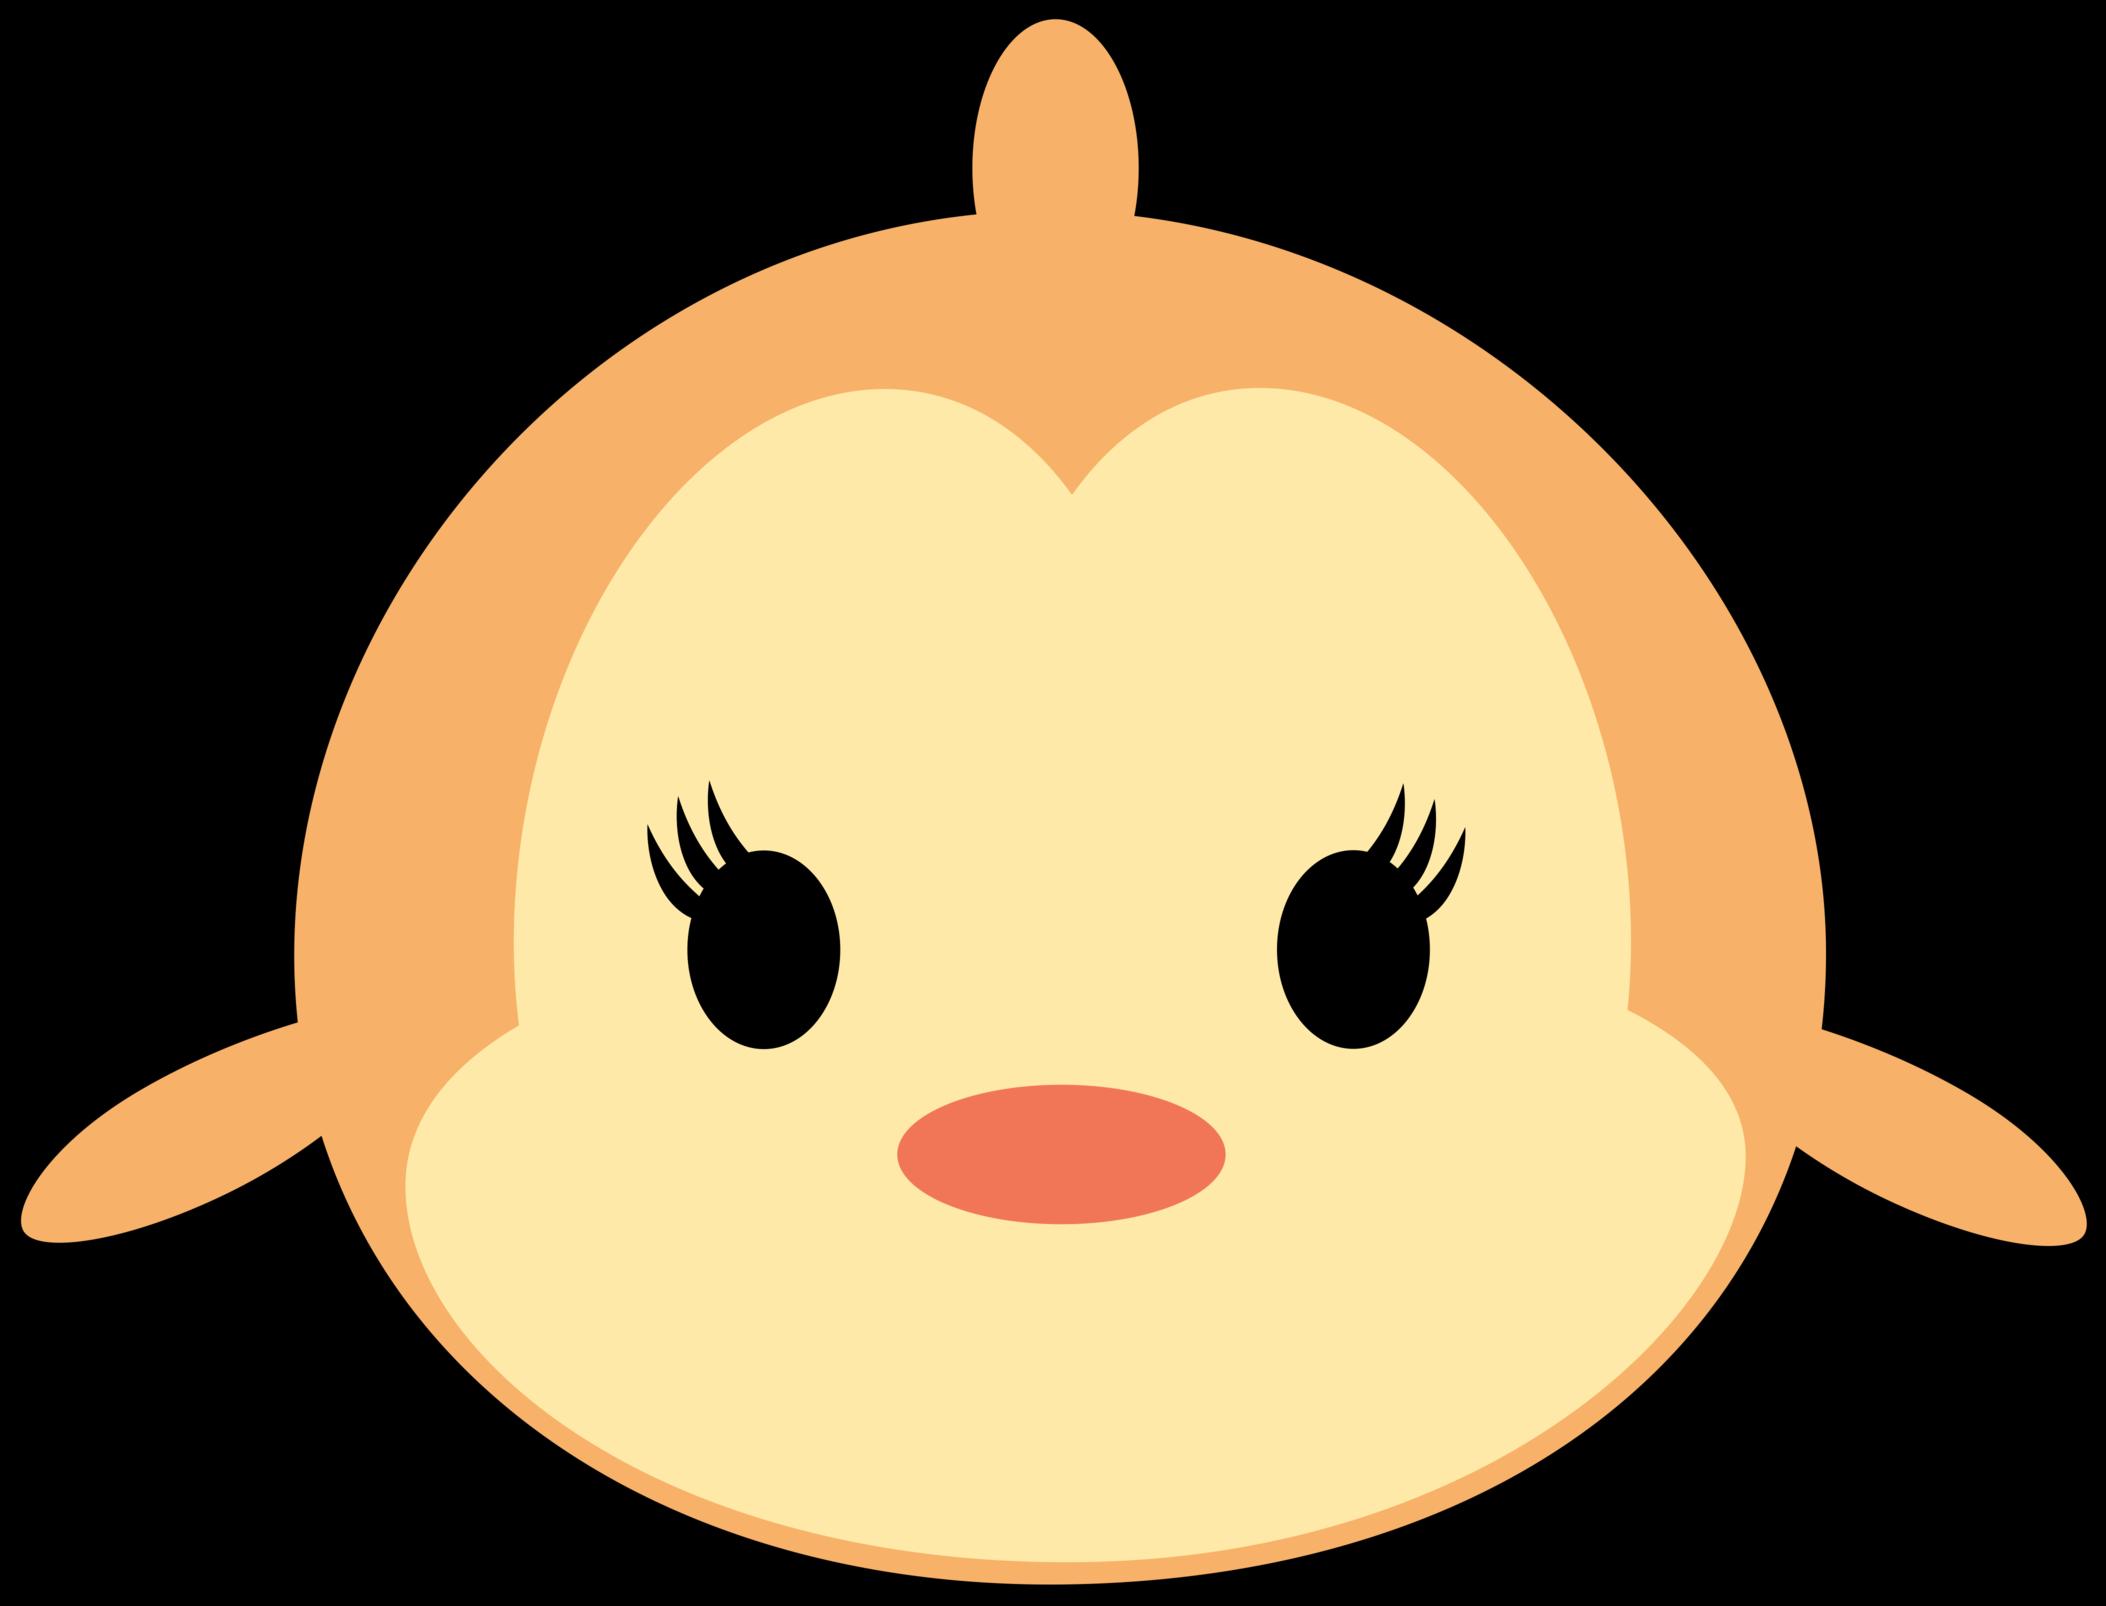 Disney Tsum Tsum Clipart 9: Disney Tsum Tsum Clipart 18